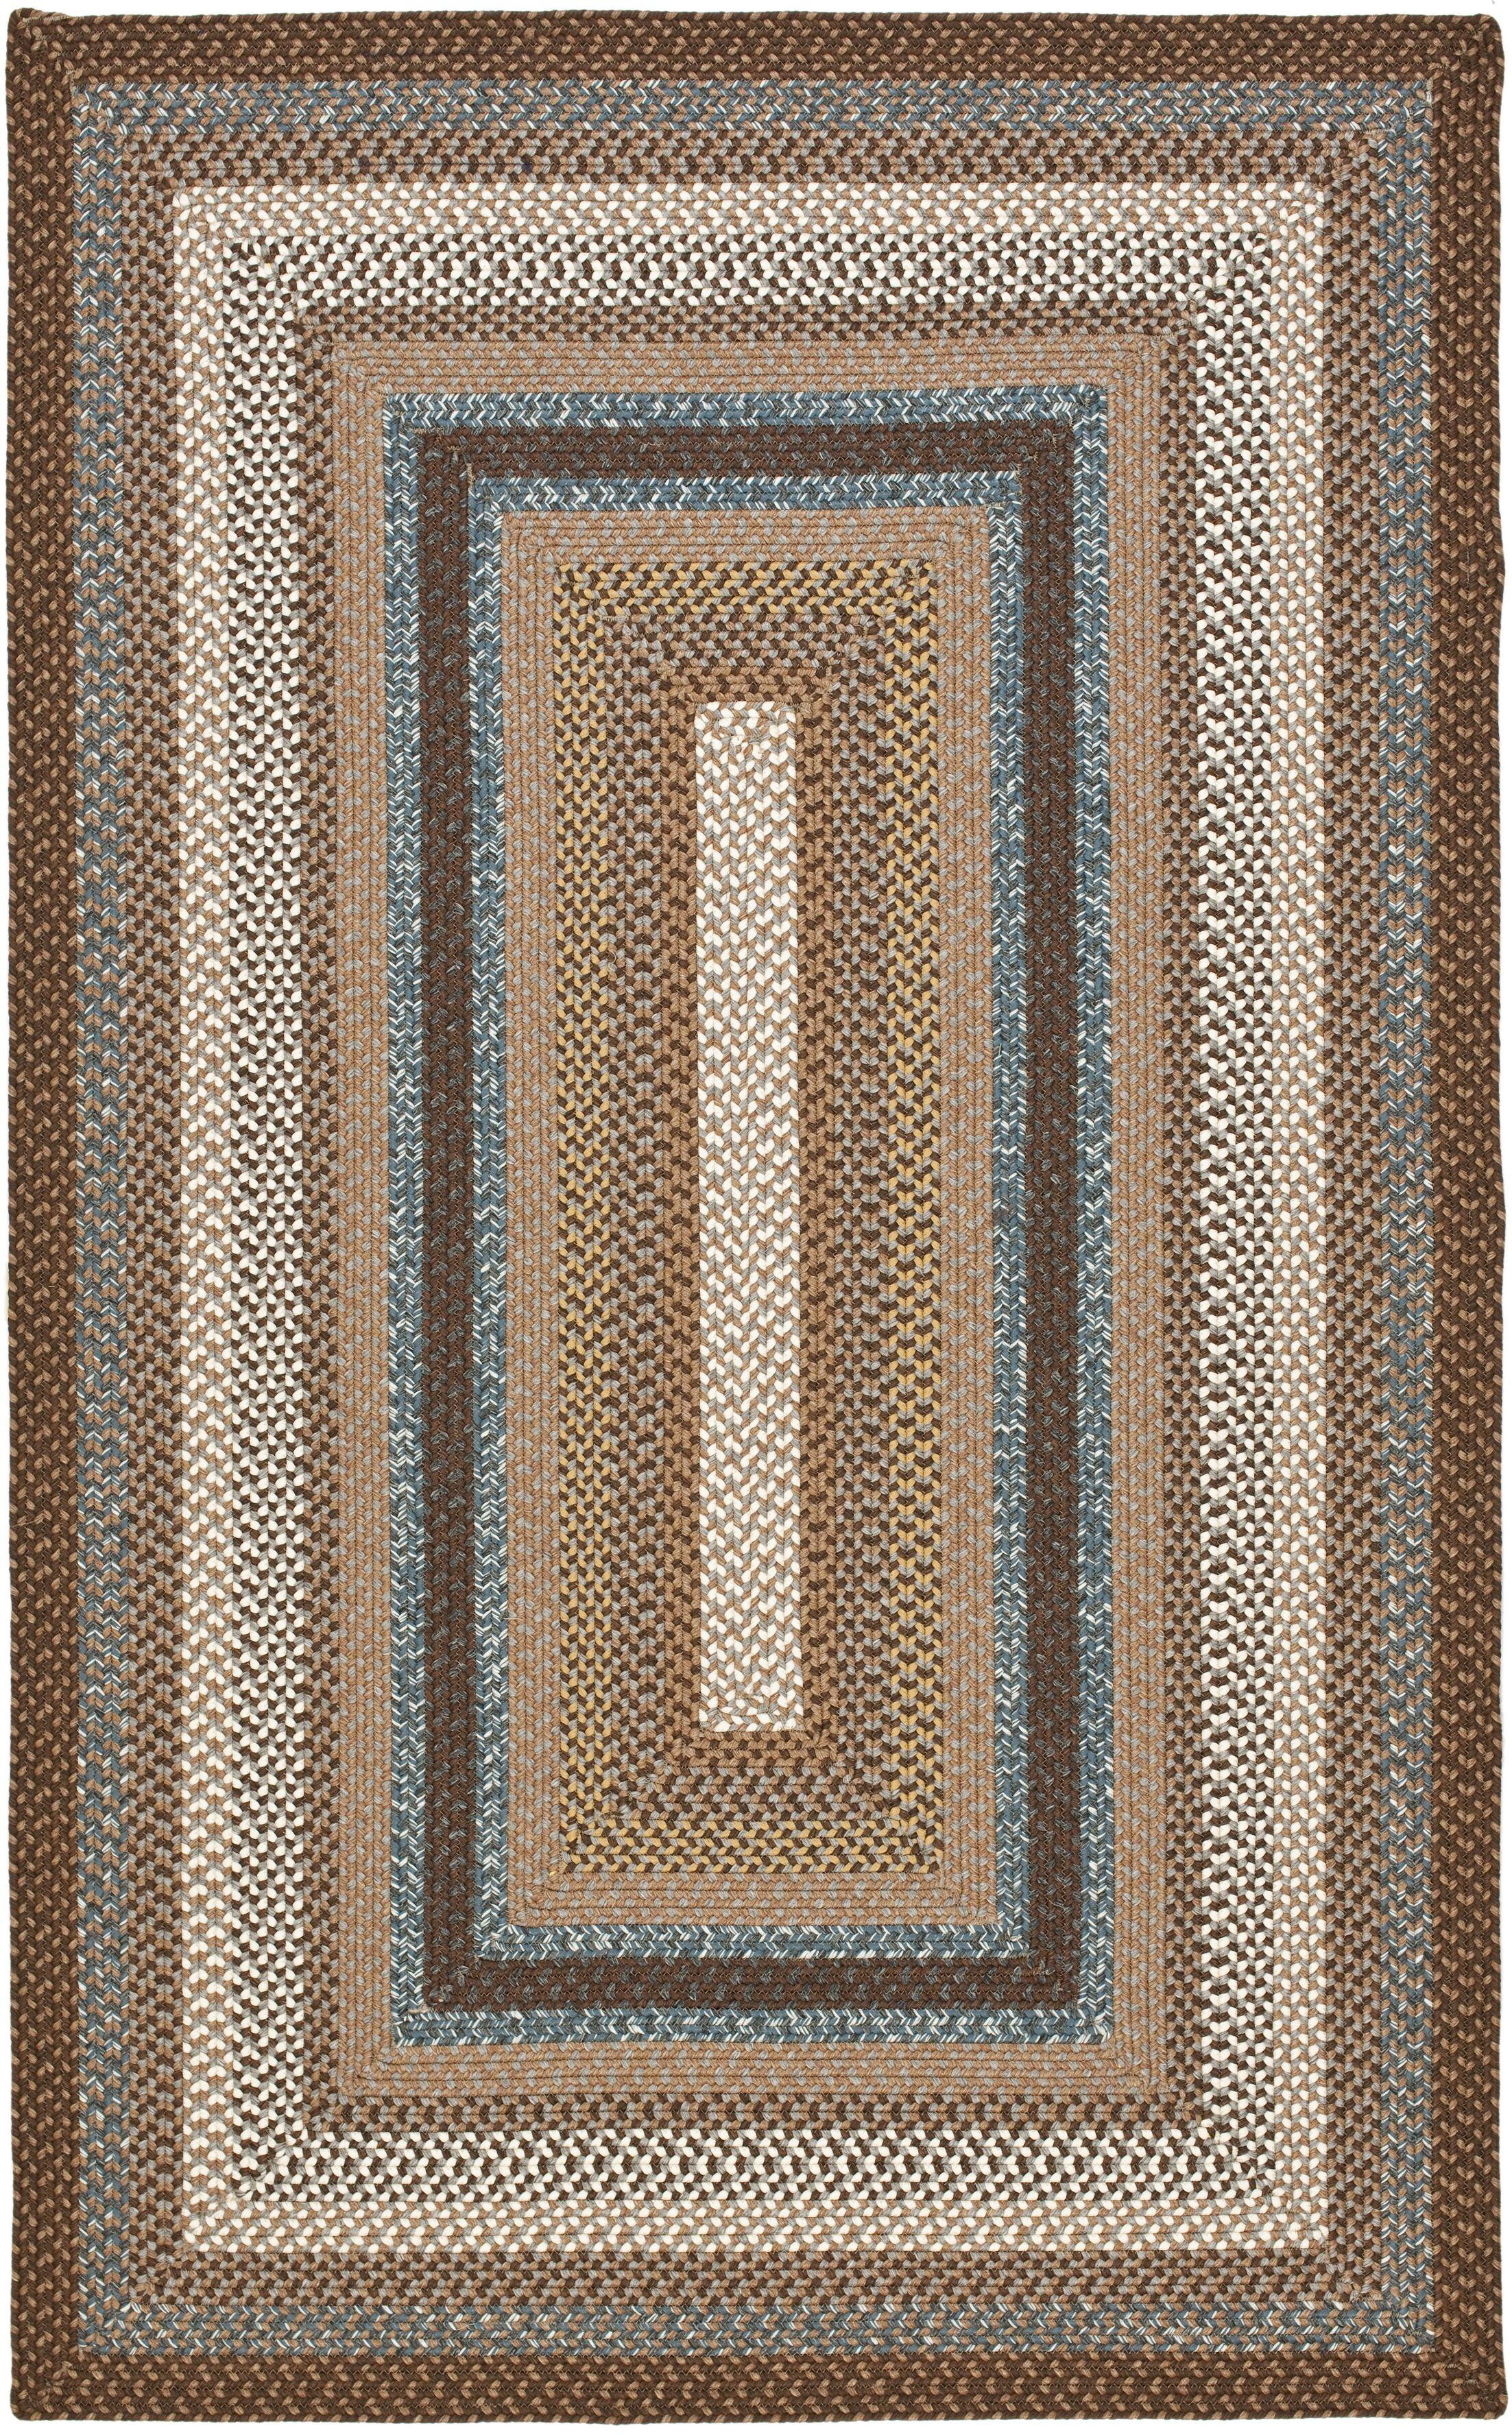 Liptak Hand-Braided Brown Area Rug Rug Size: Rectangle 9' x 12'